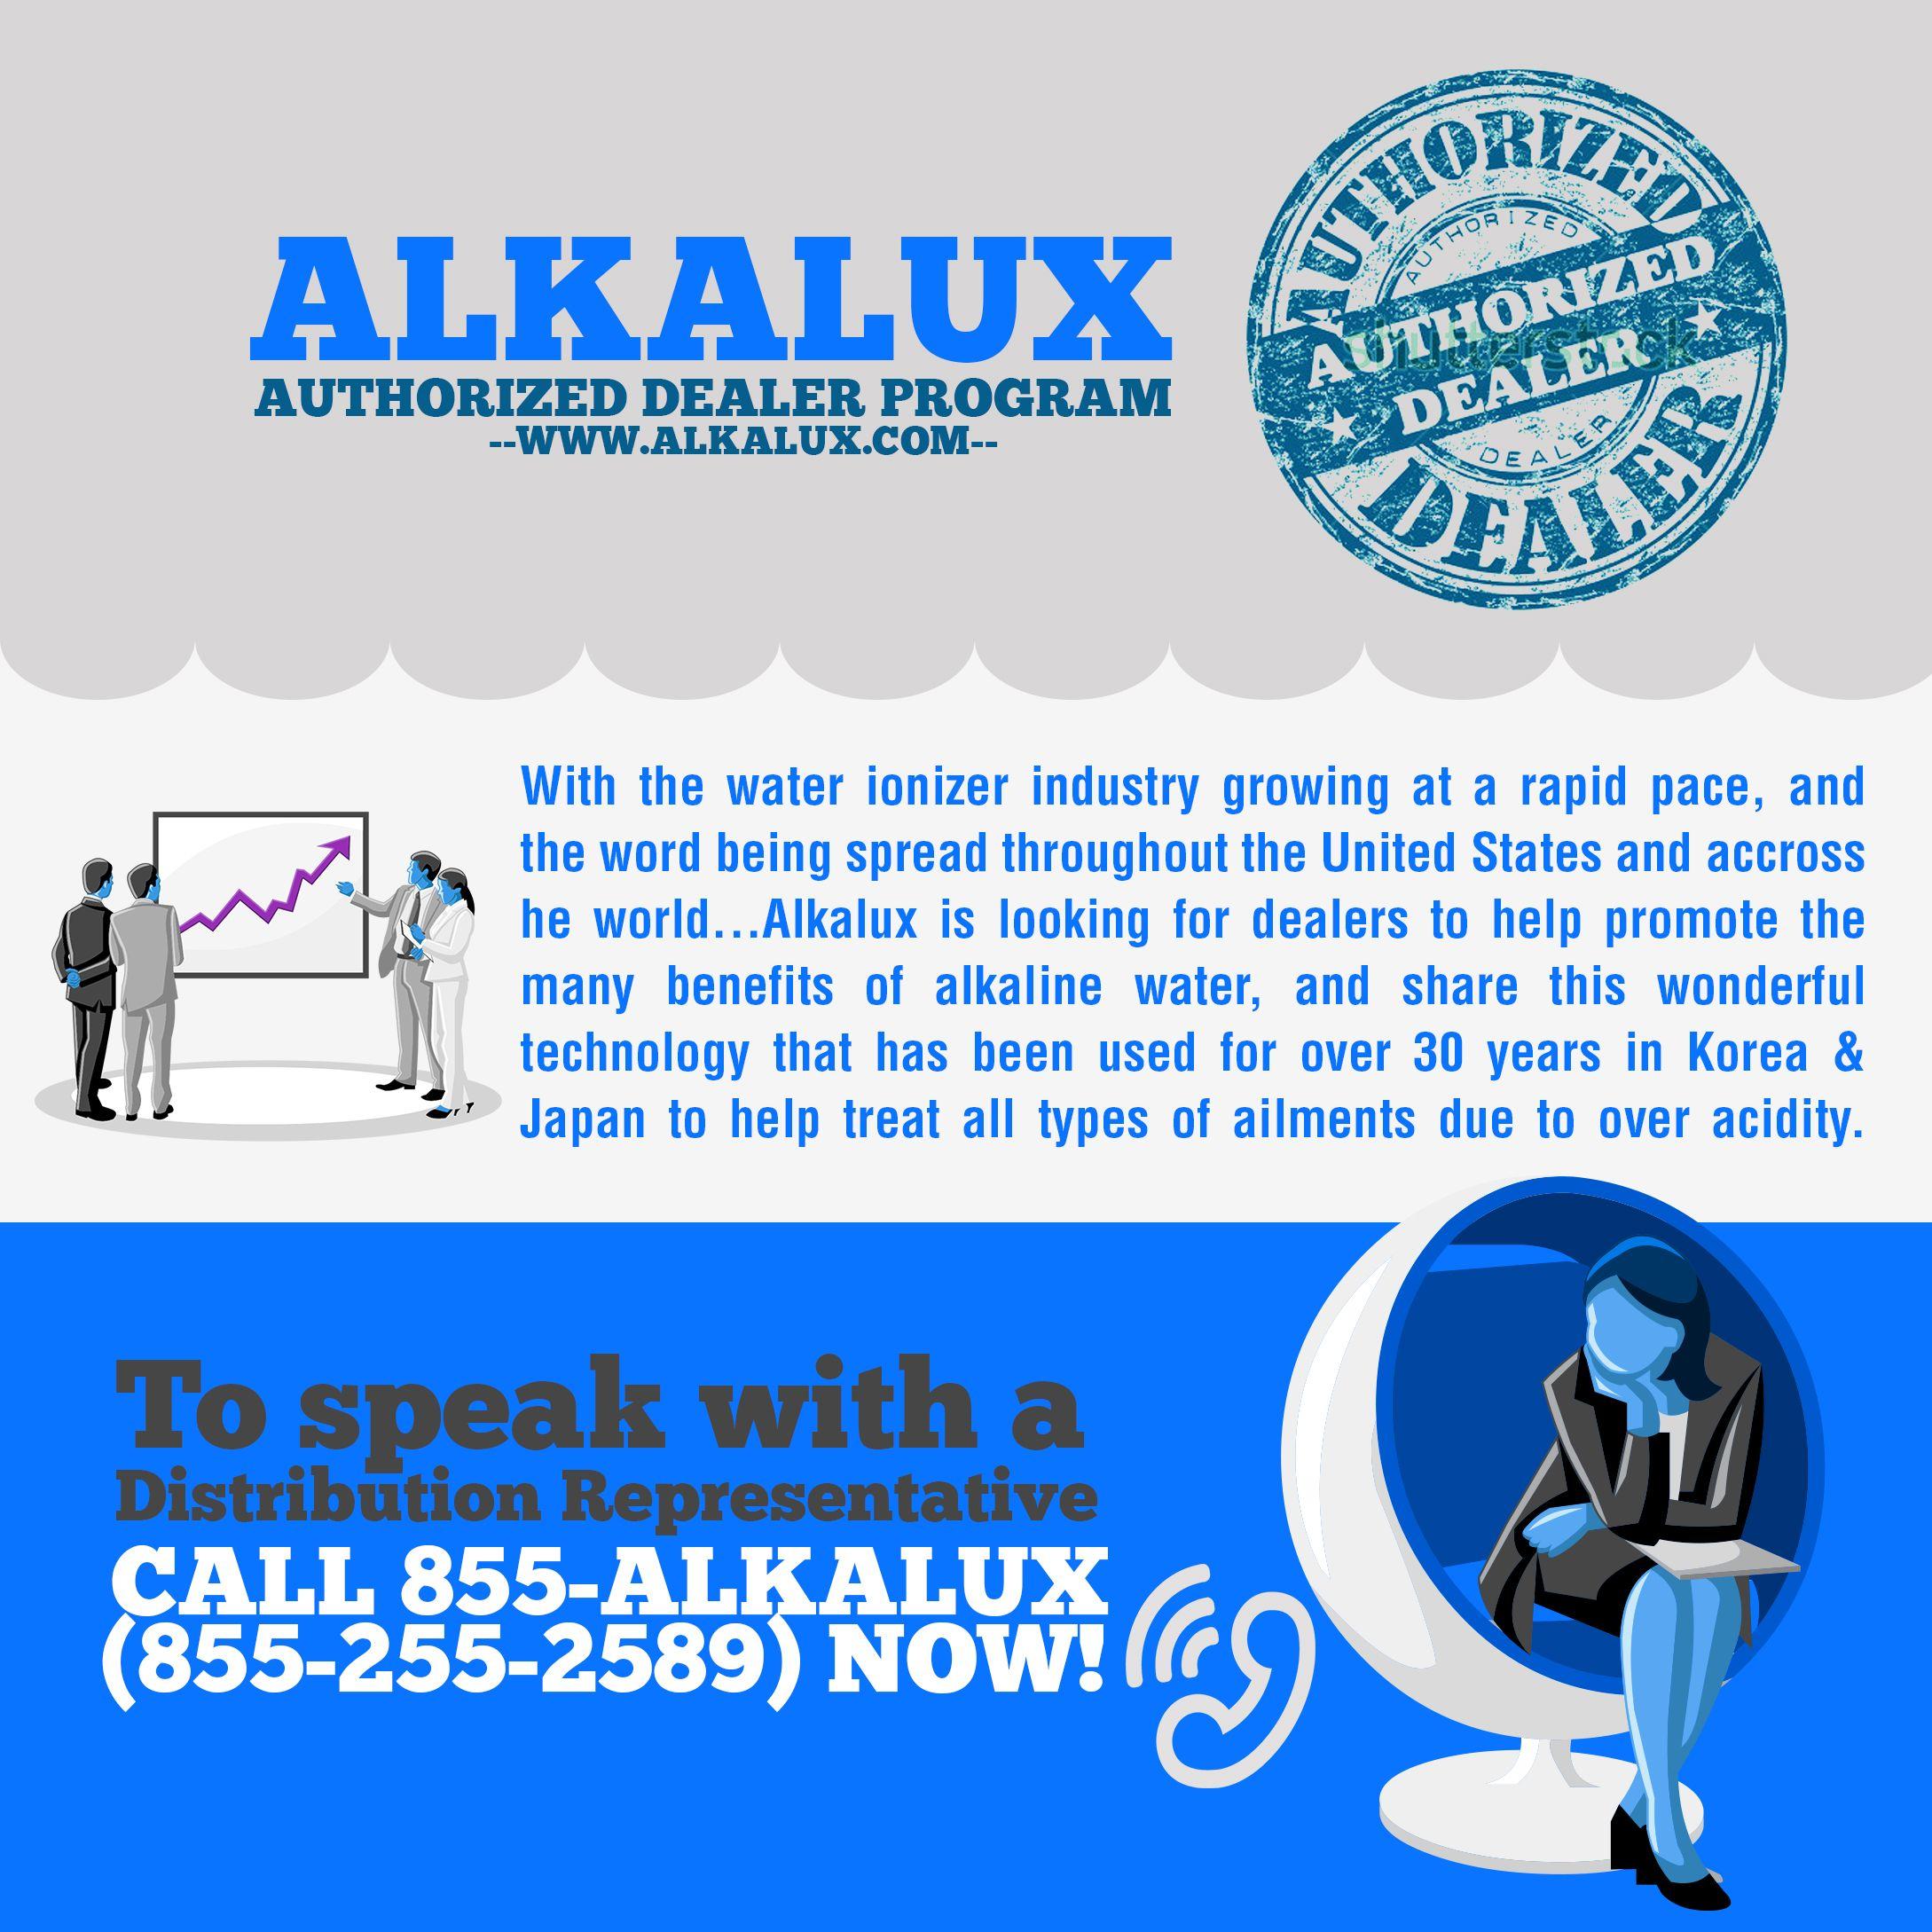 Alkalux Authorized Dealer Program http://www.alkalux.com/become-a-dealer